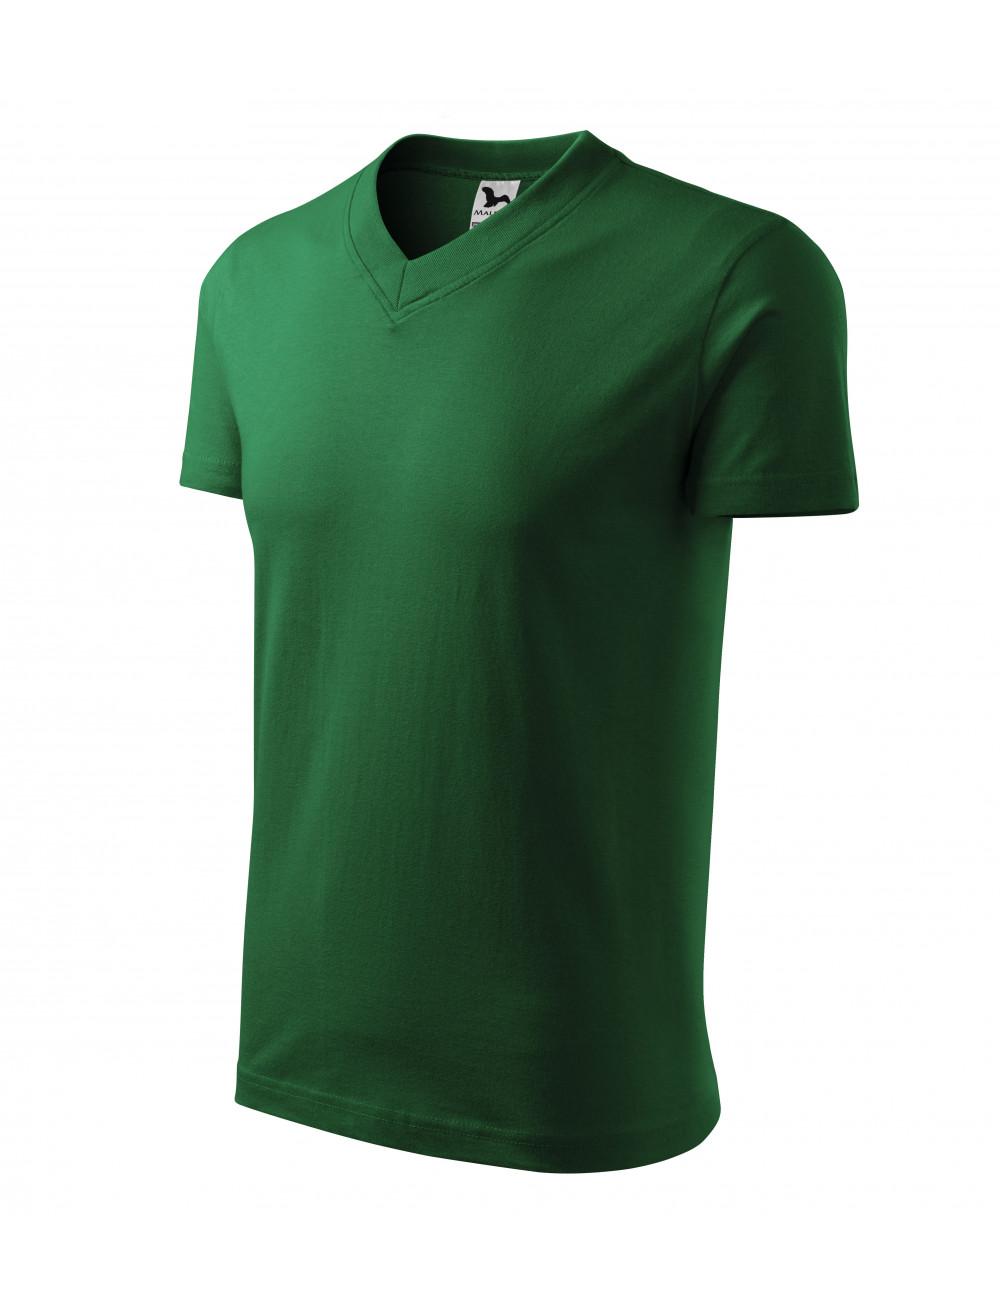 Adler MALFINI Koszulka unisex V-neck 102 zieleń butelkowa